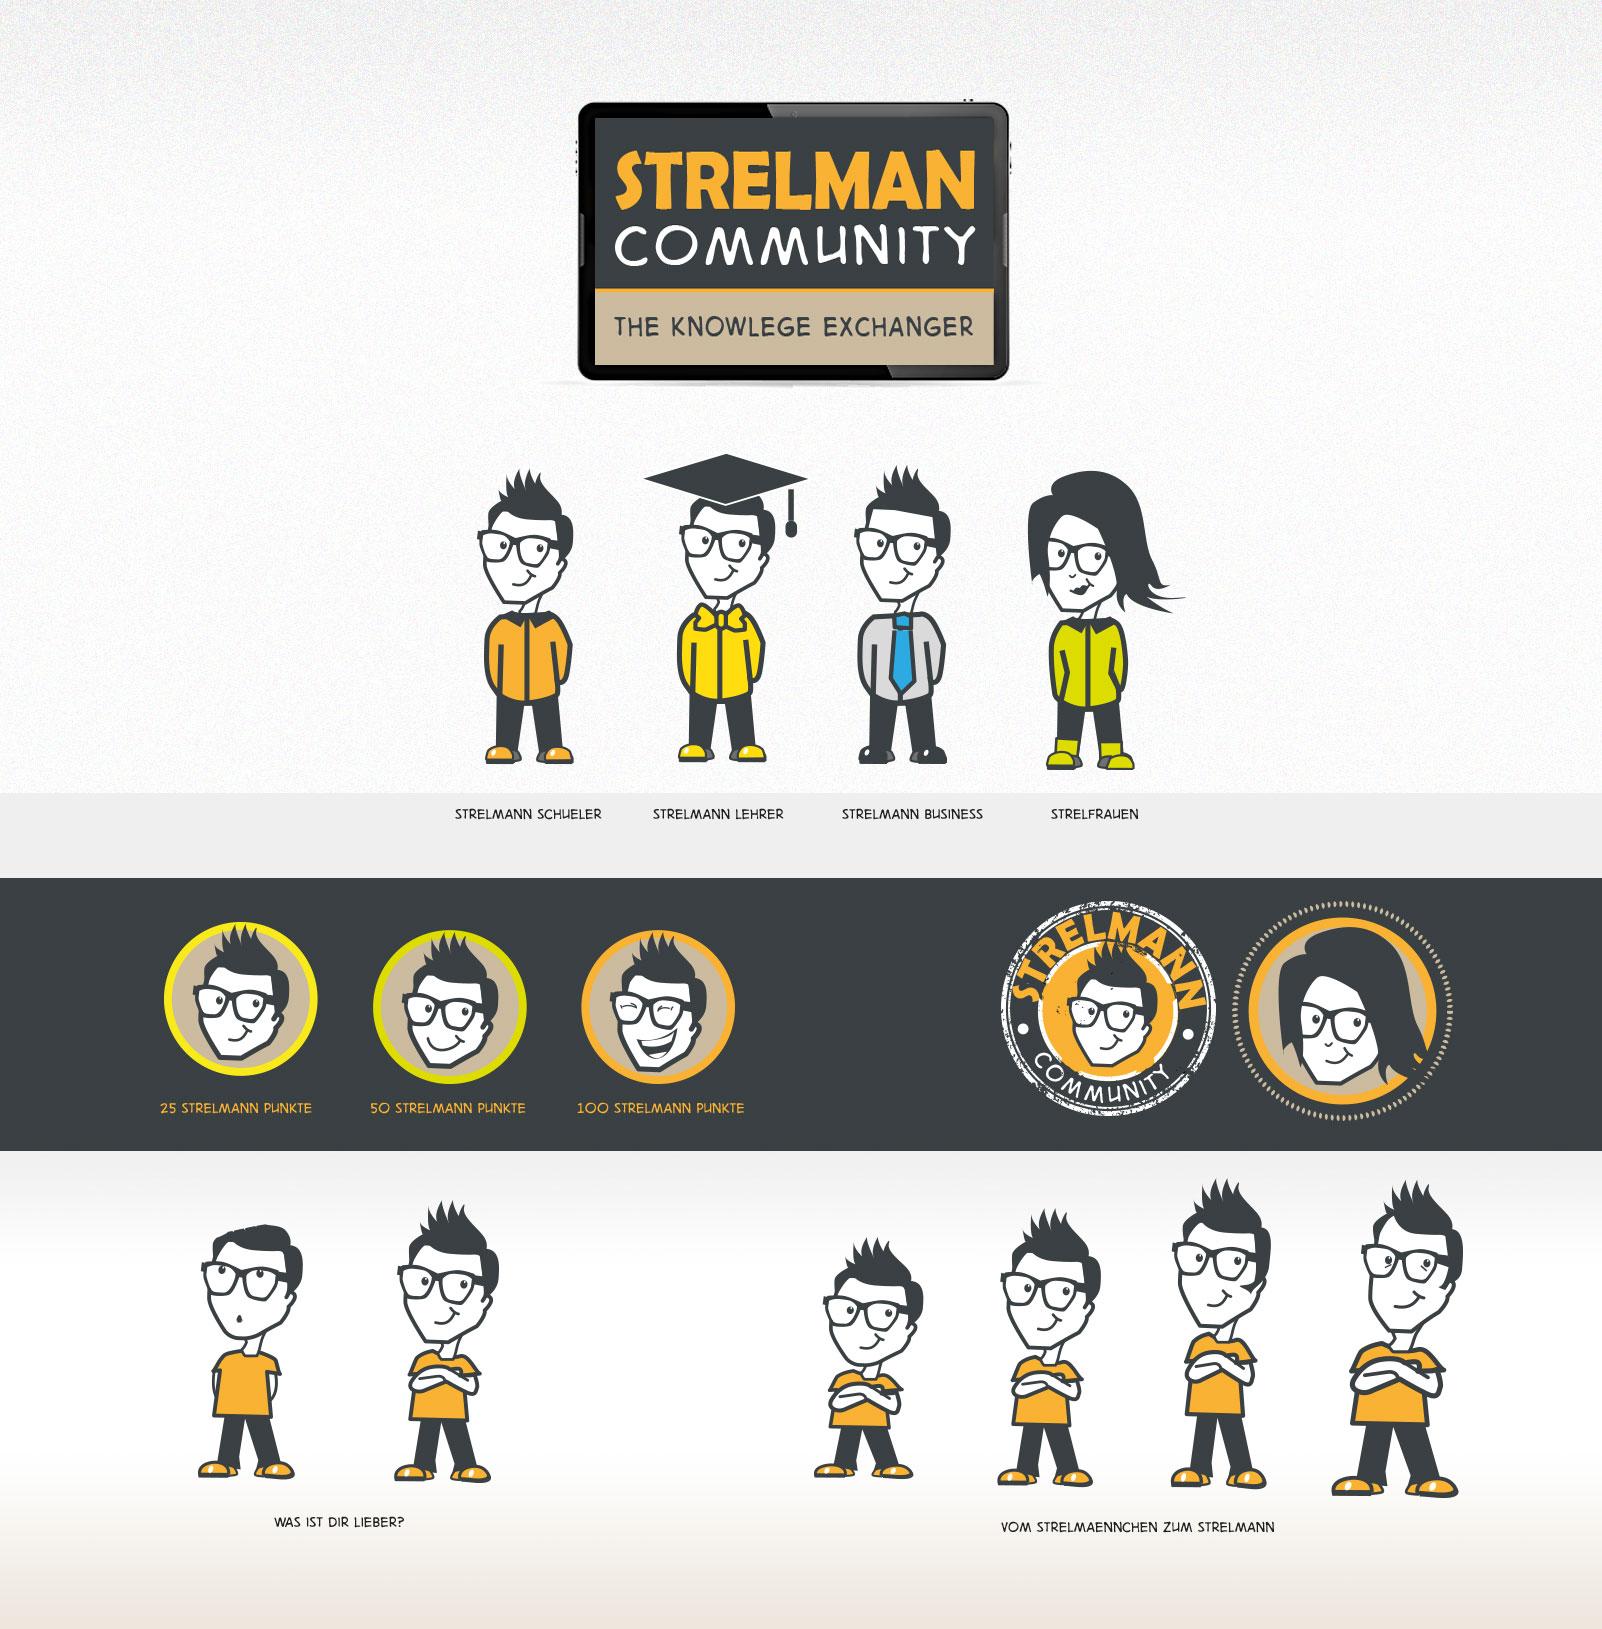 STRELMAN COMMUNITY